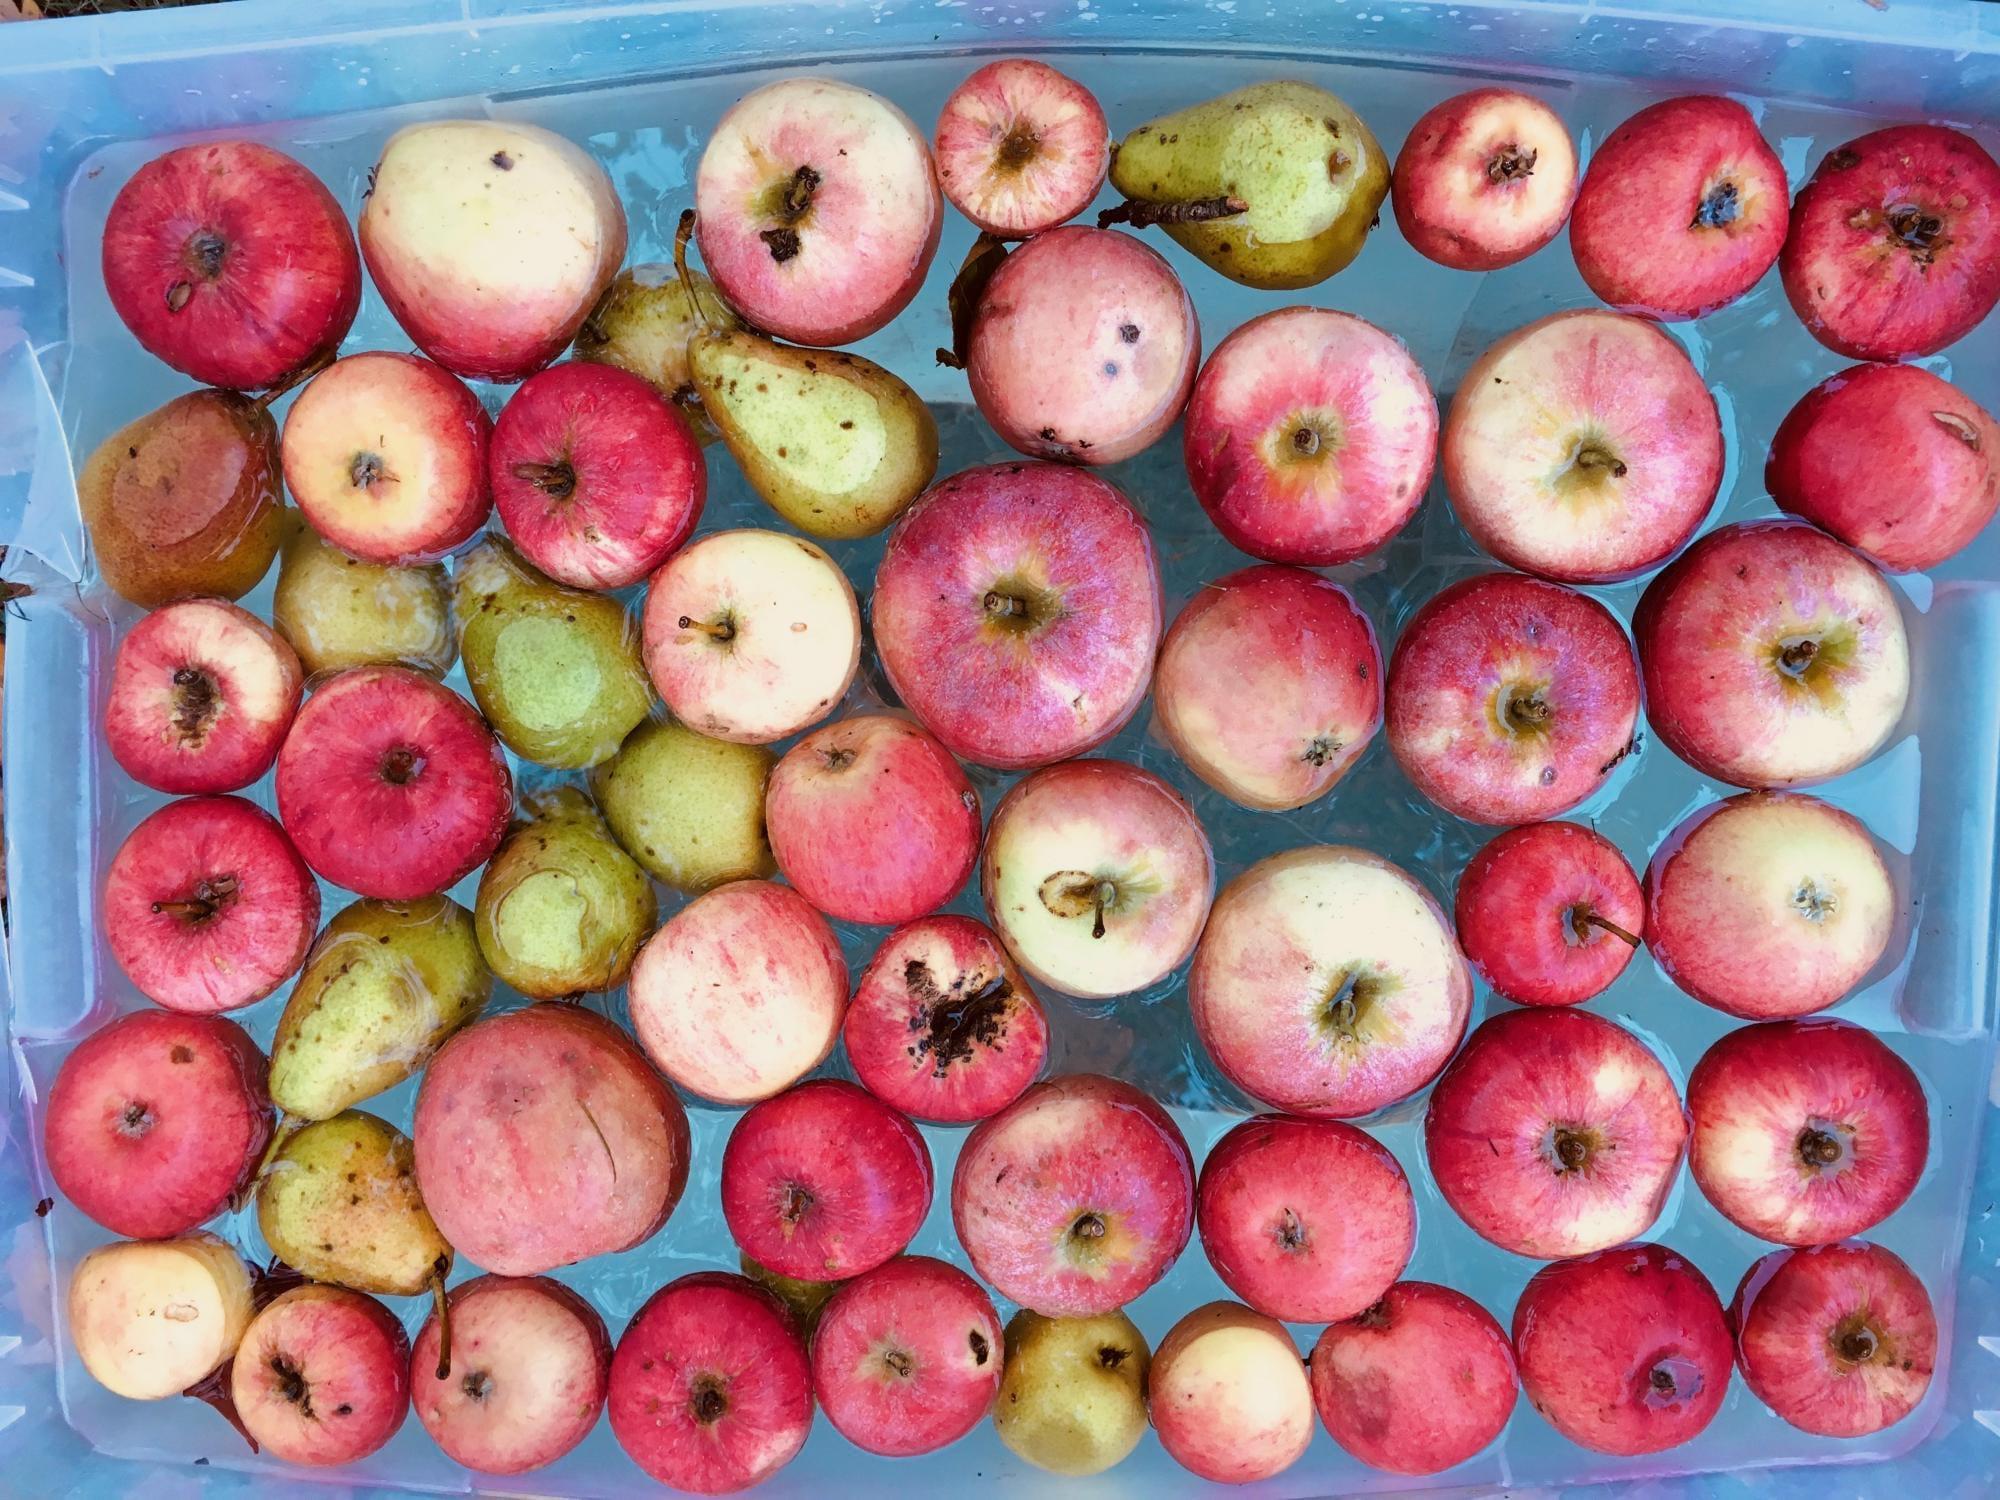 The golden season: apple pressing and mushroom foraging at Haga*